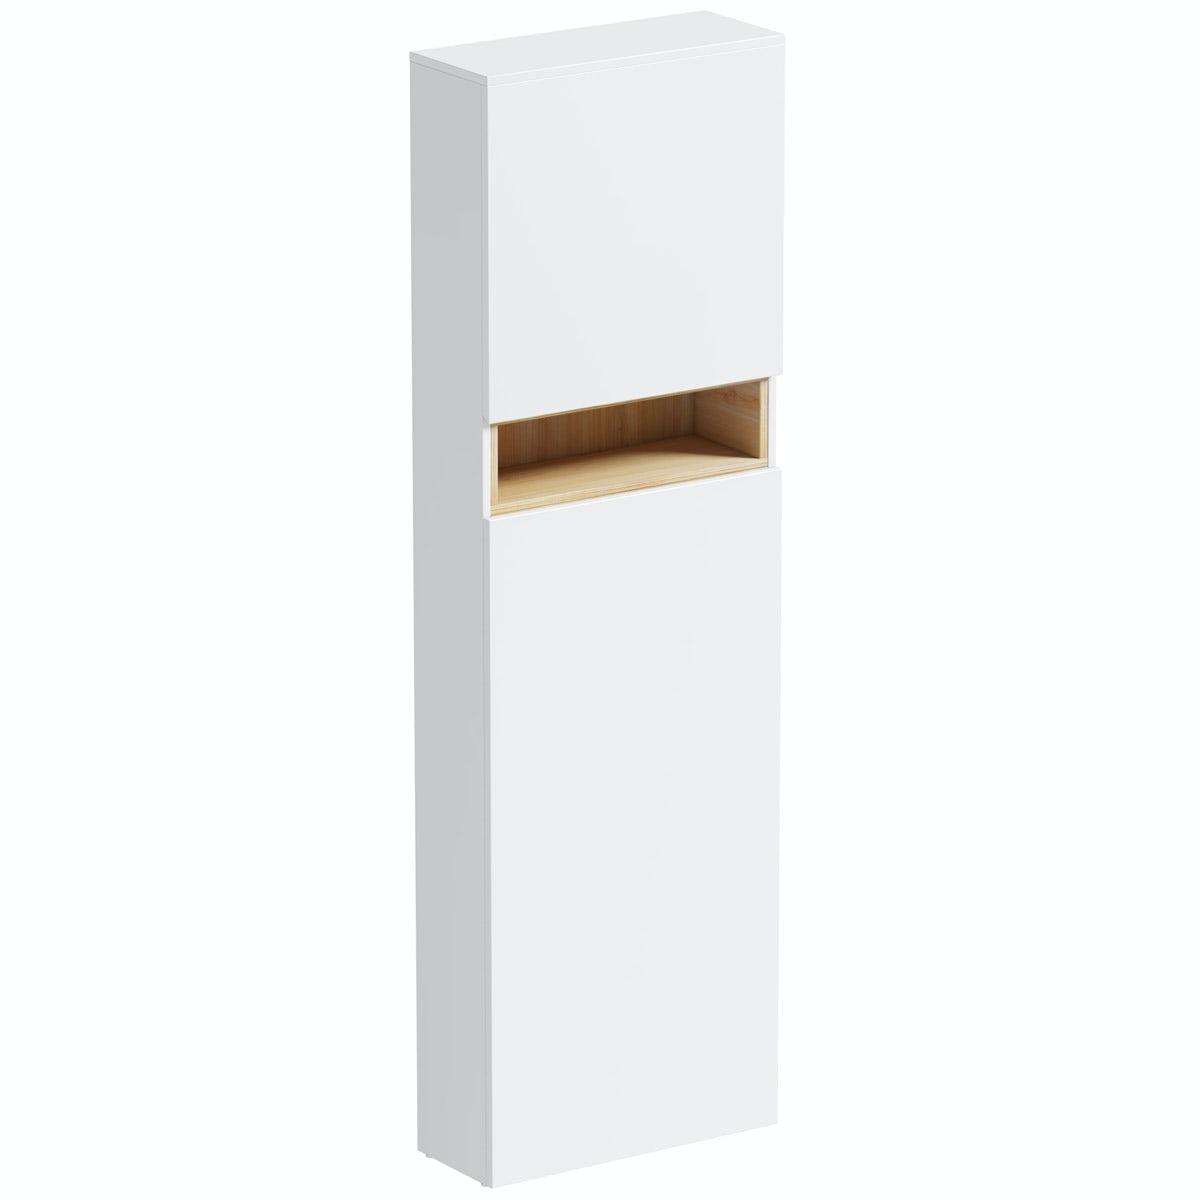 Mode Tate white & oak tall back to wall toilet unit